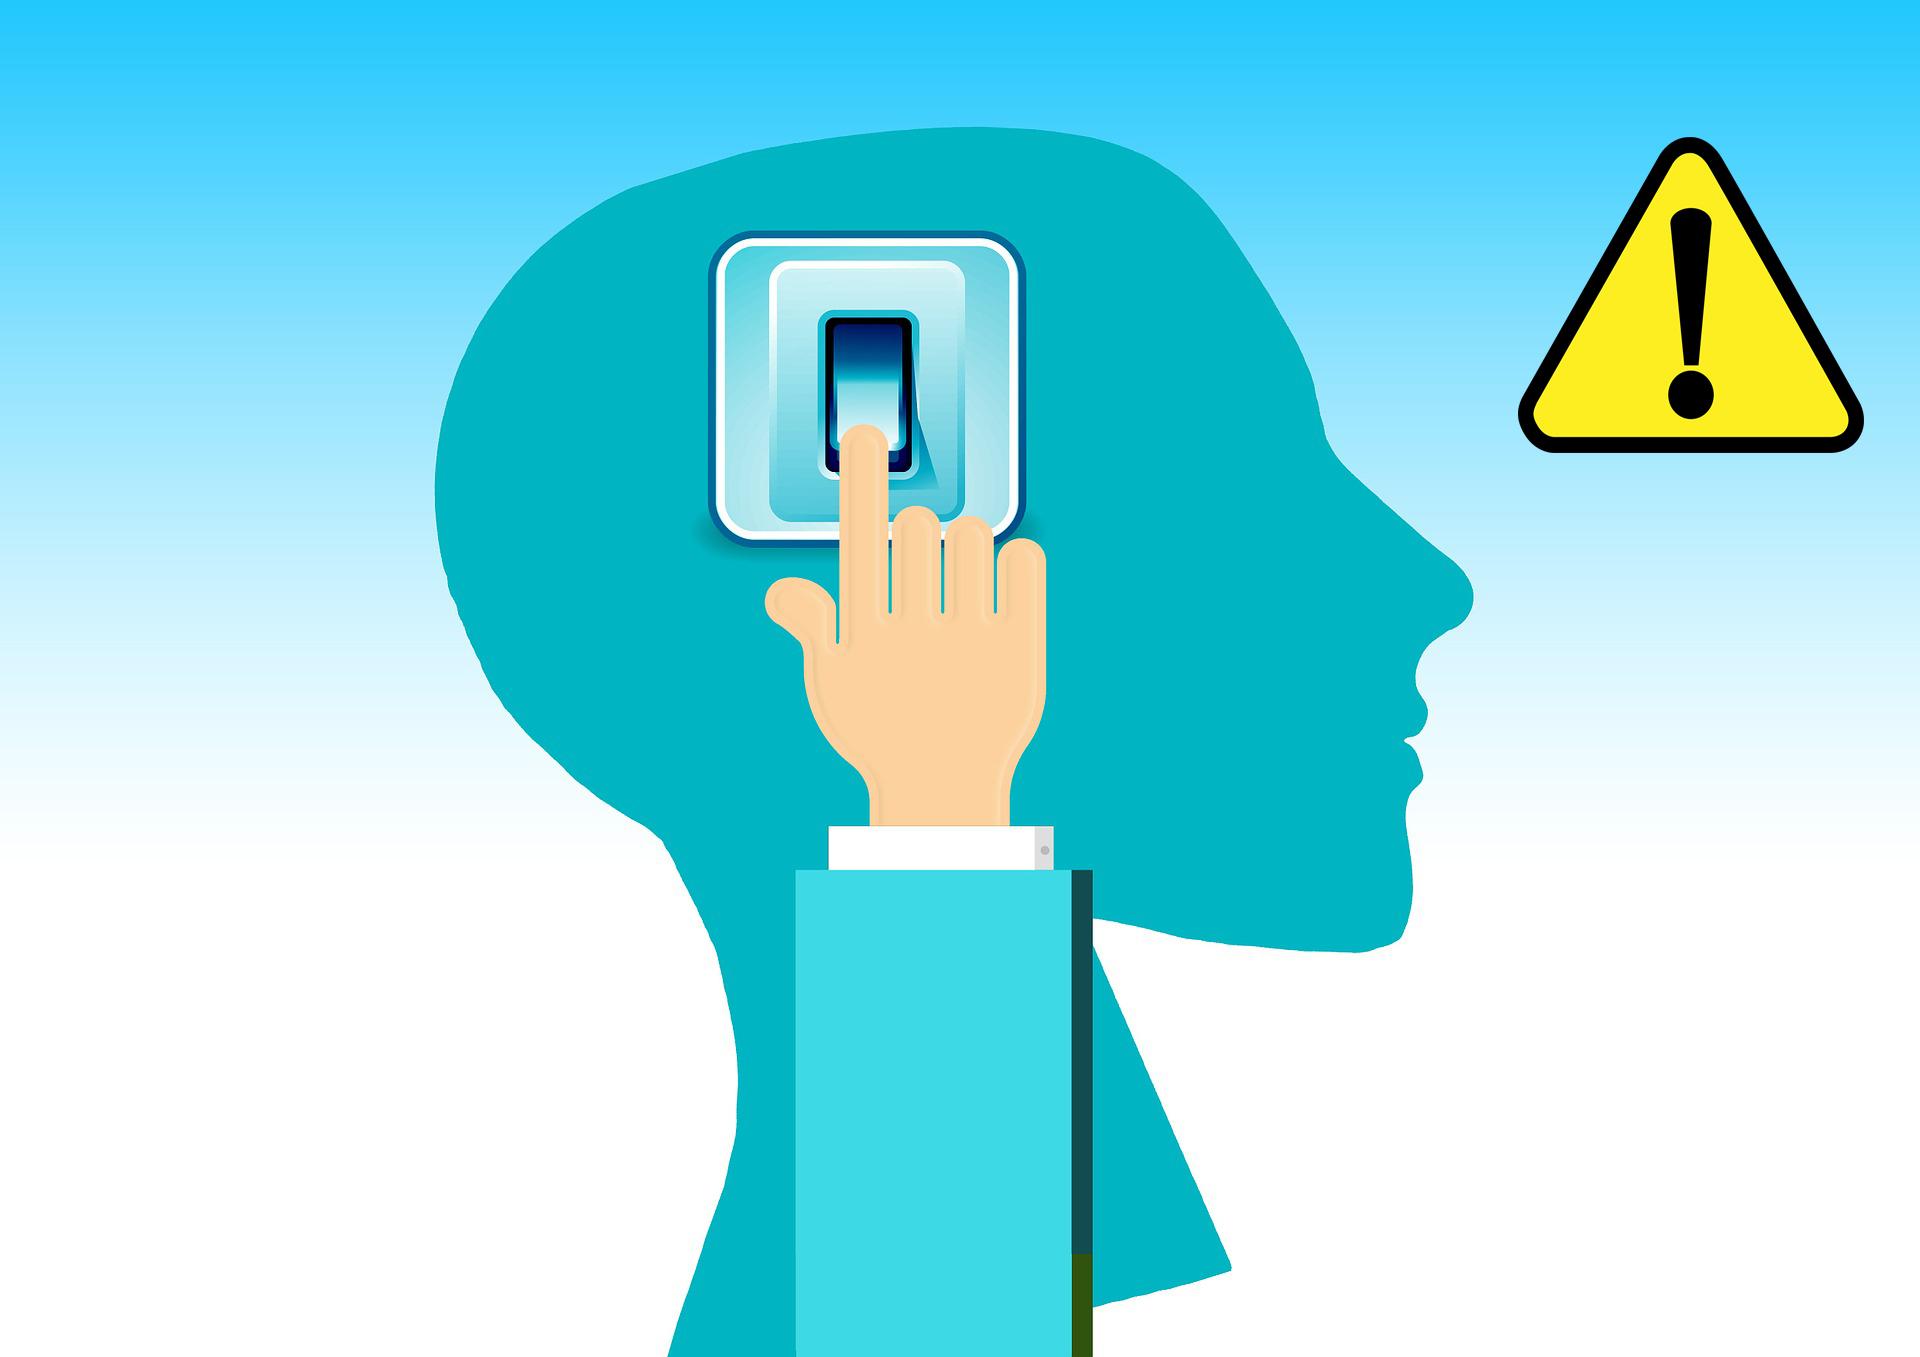 Wie Du deine Angst austrickst! – 4 psychologische Techniken, um bei Angst cool zu bleiben